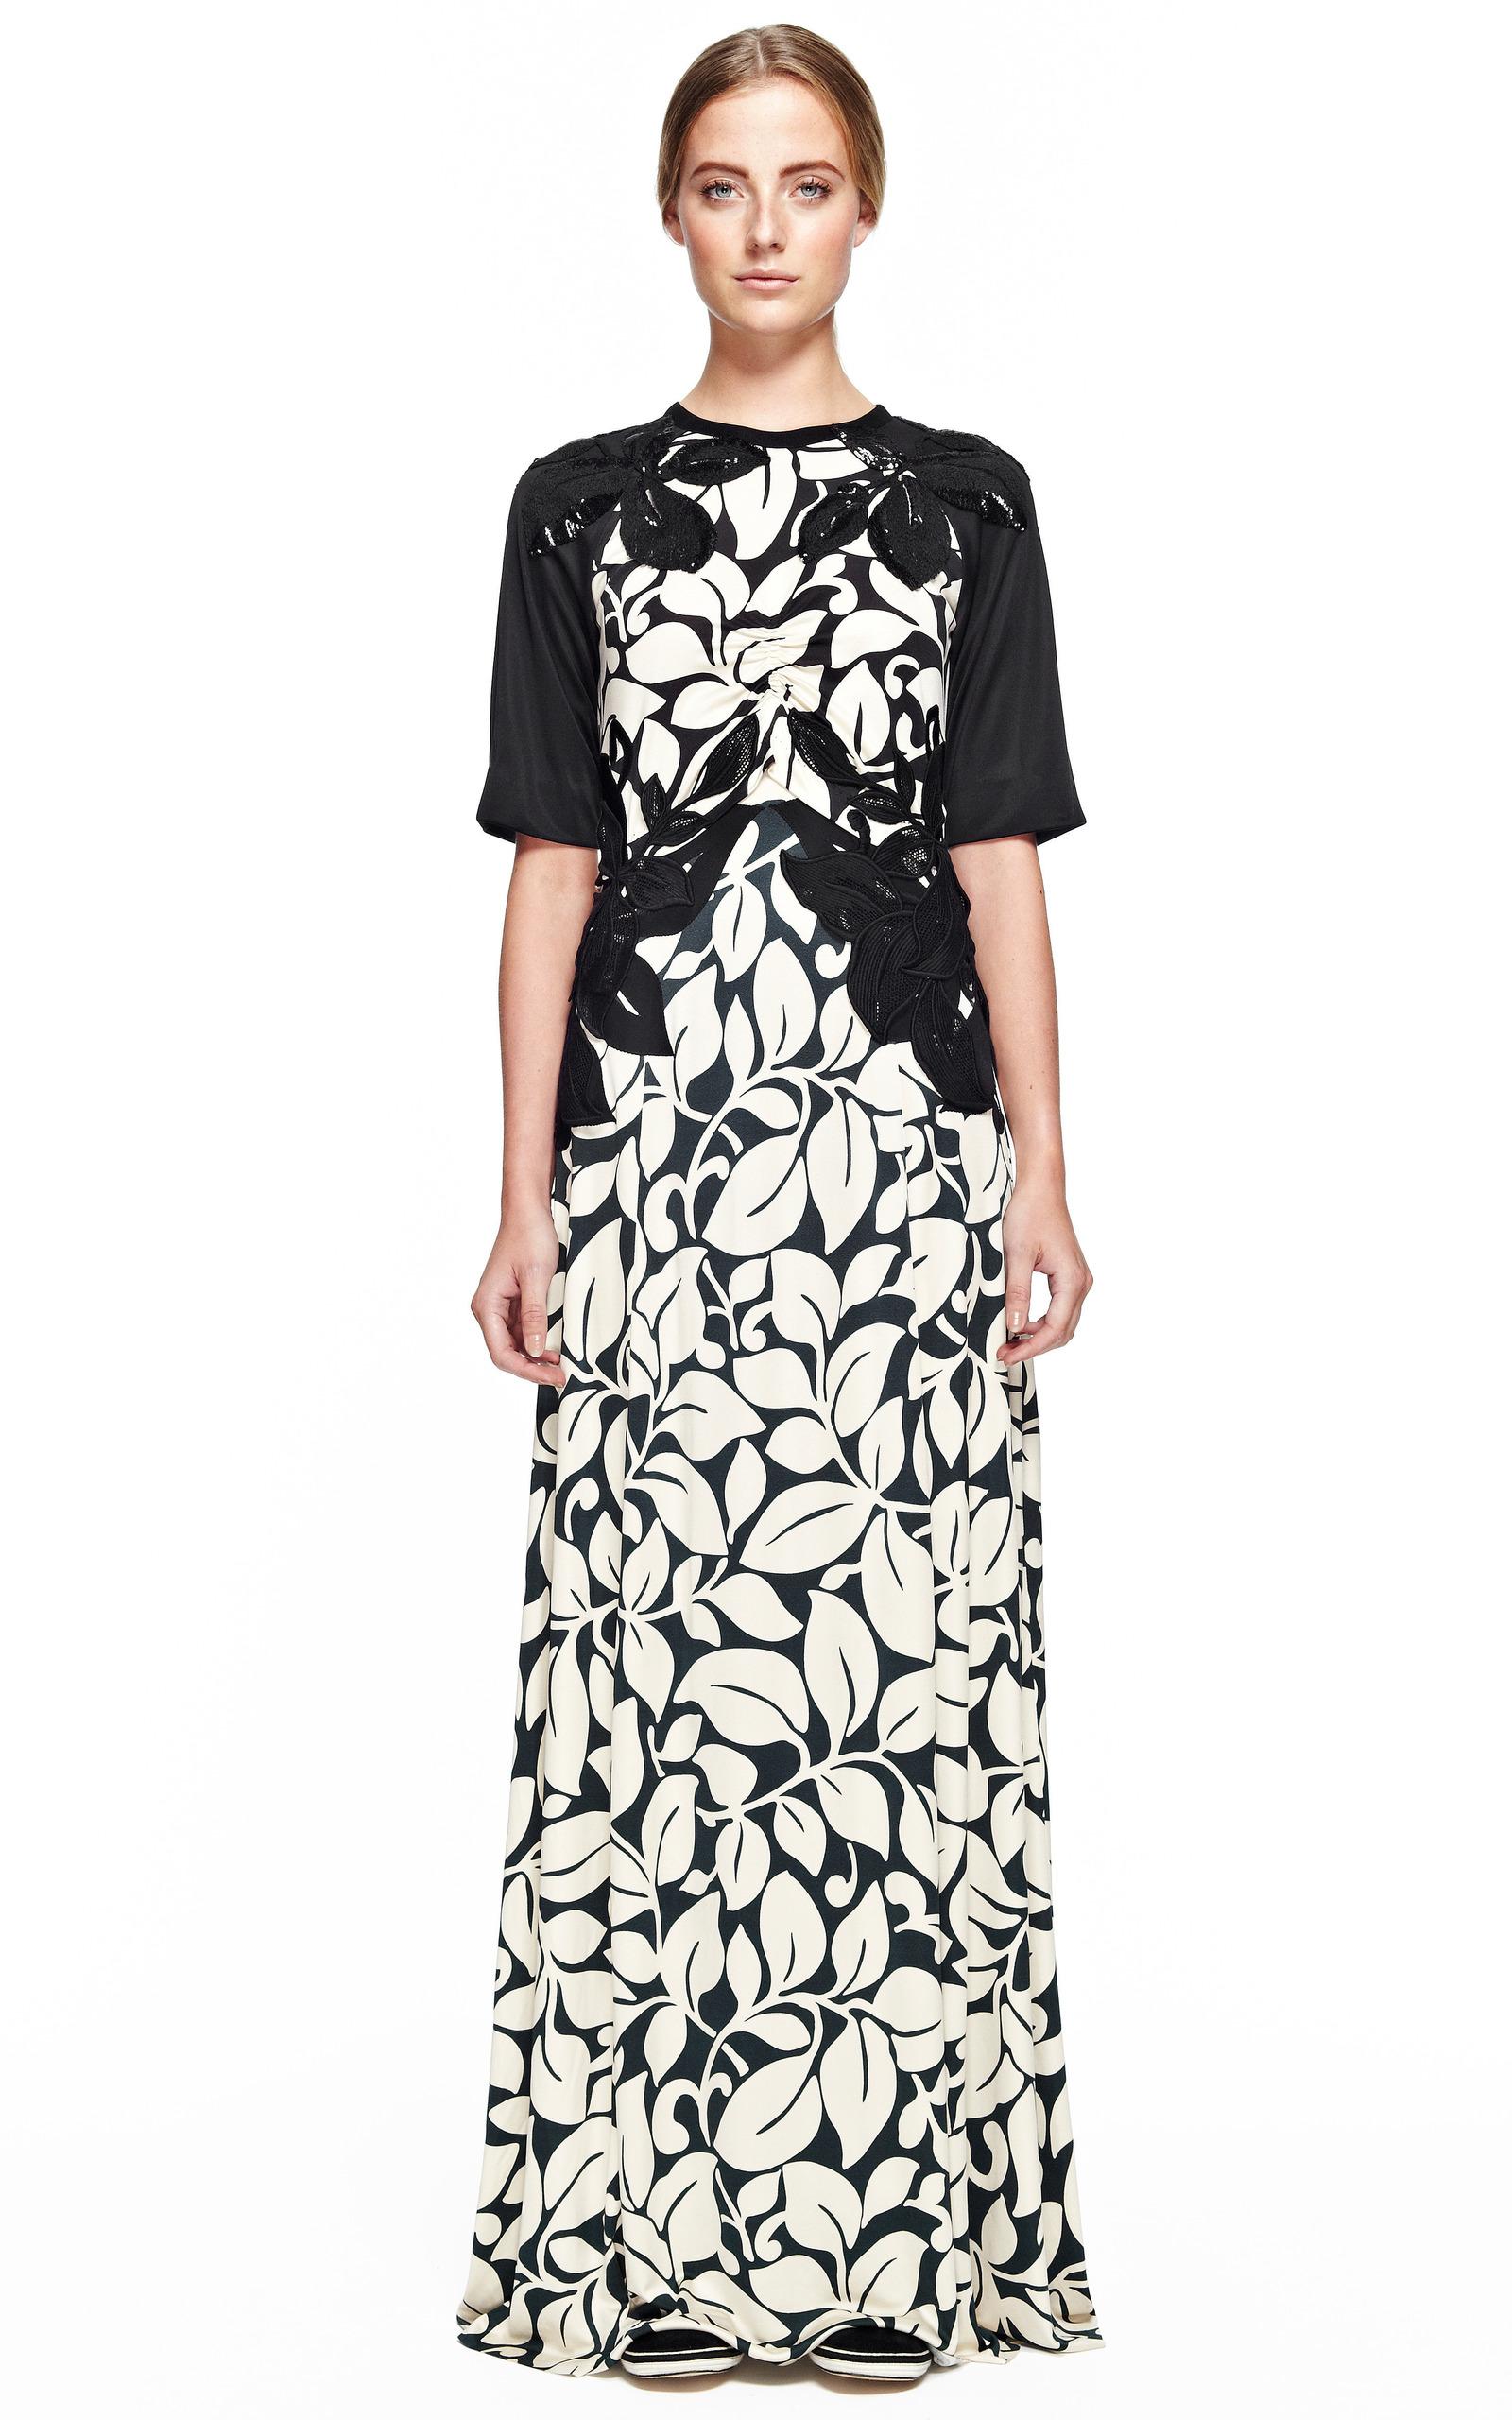 Breadfruit silk jersey short sleeve long t shirt dress for Long sleeve silk shirt dress